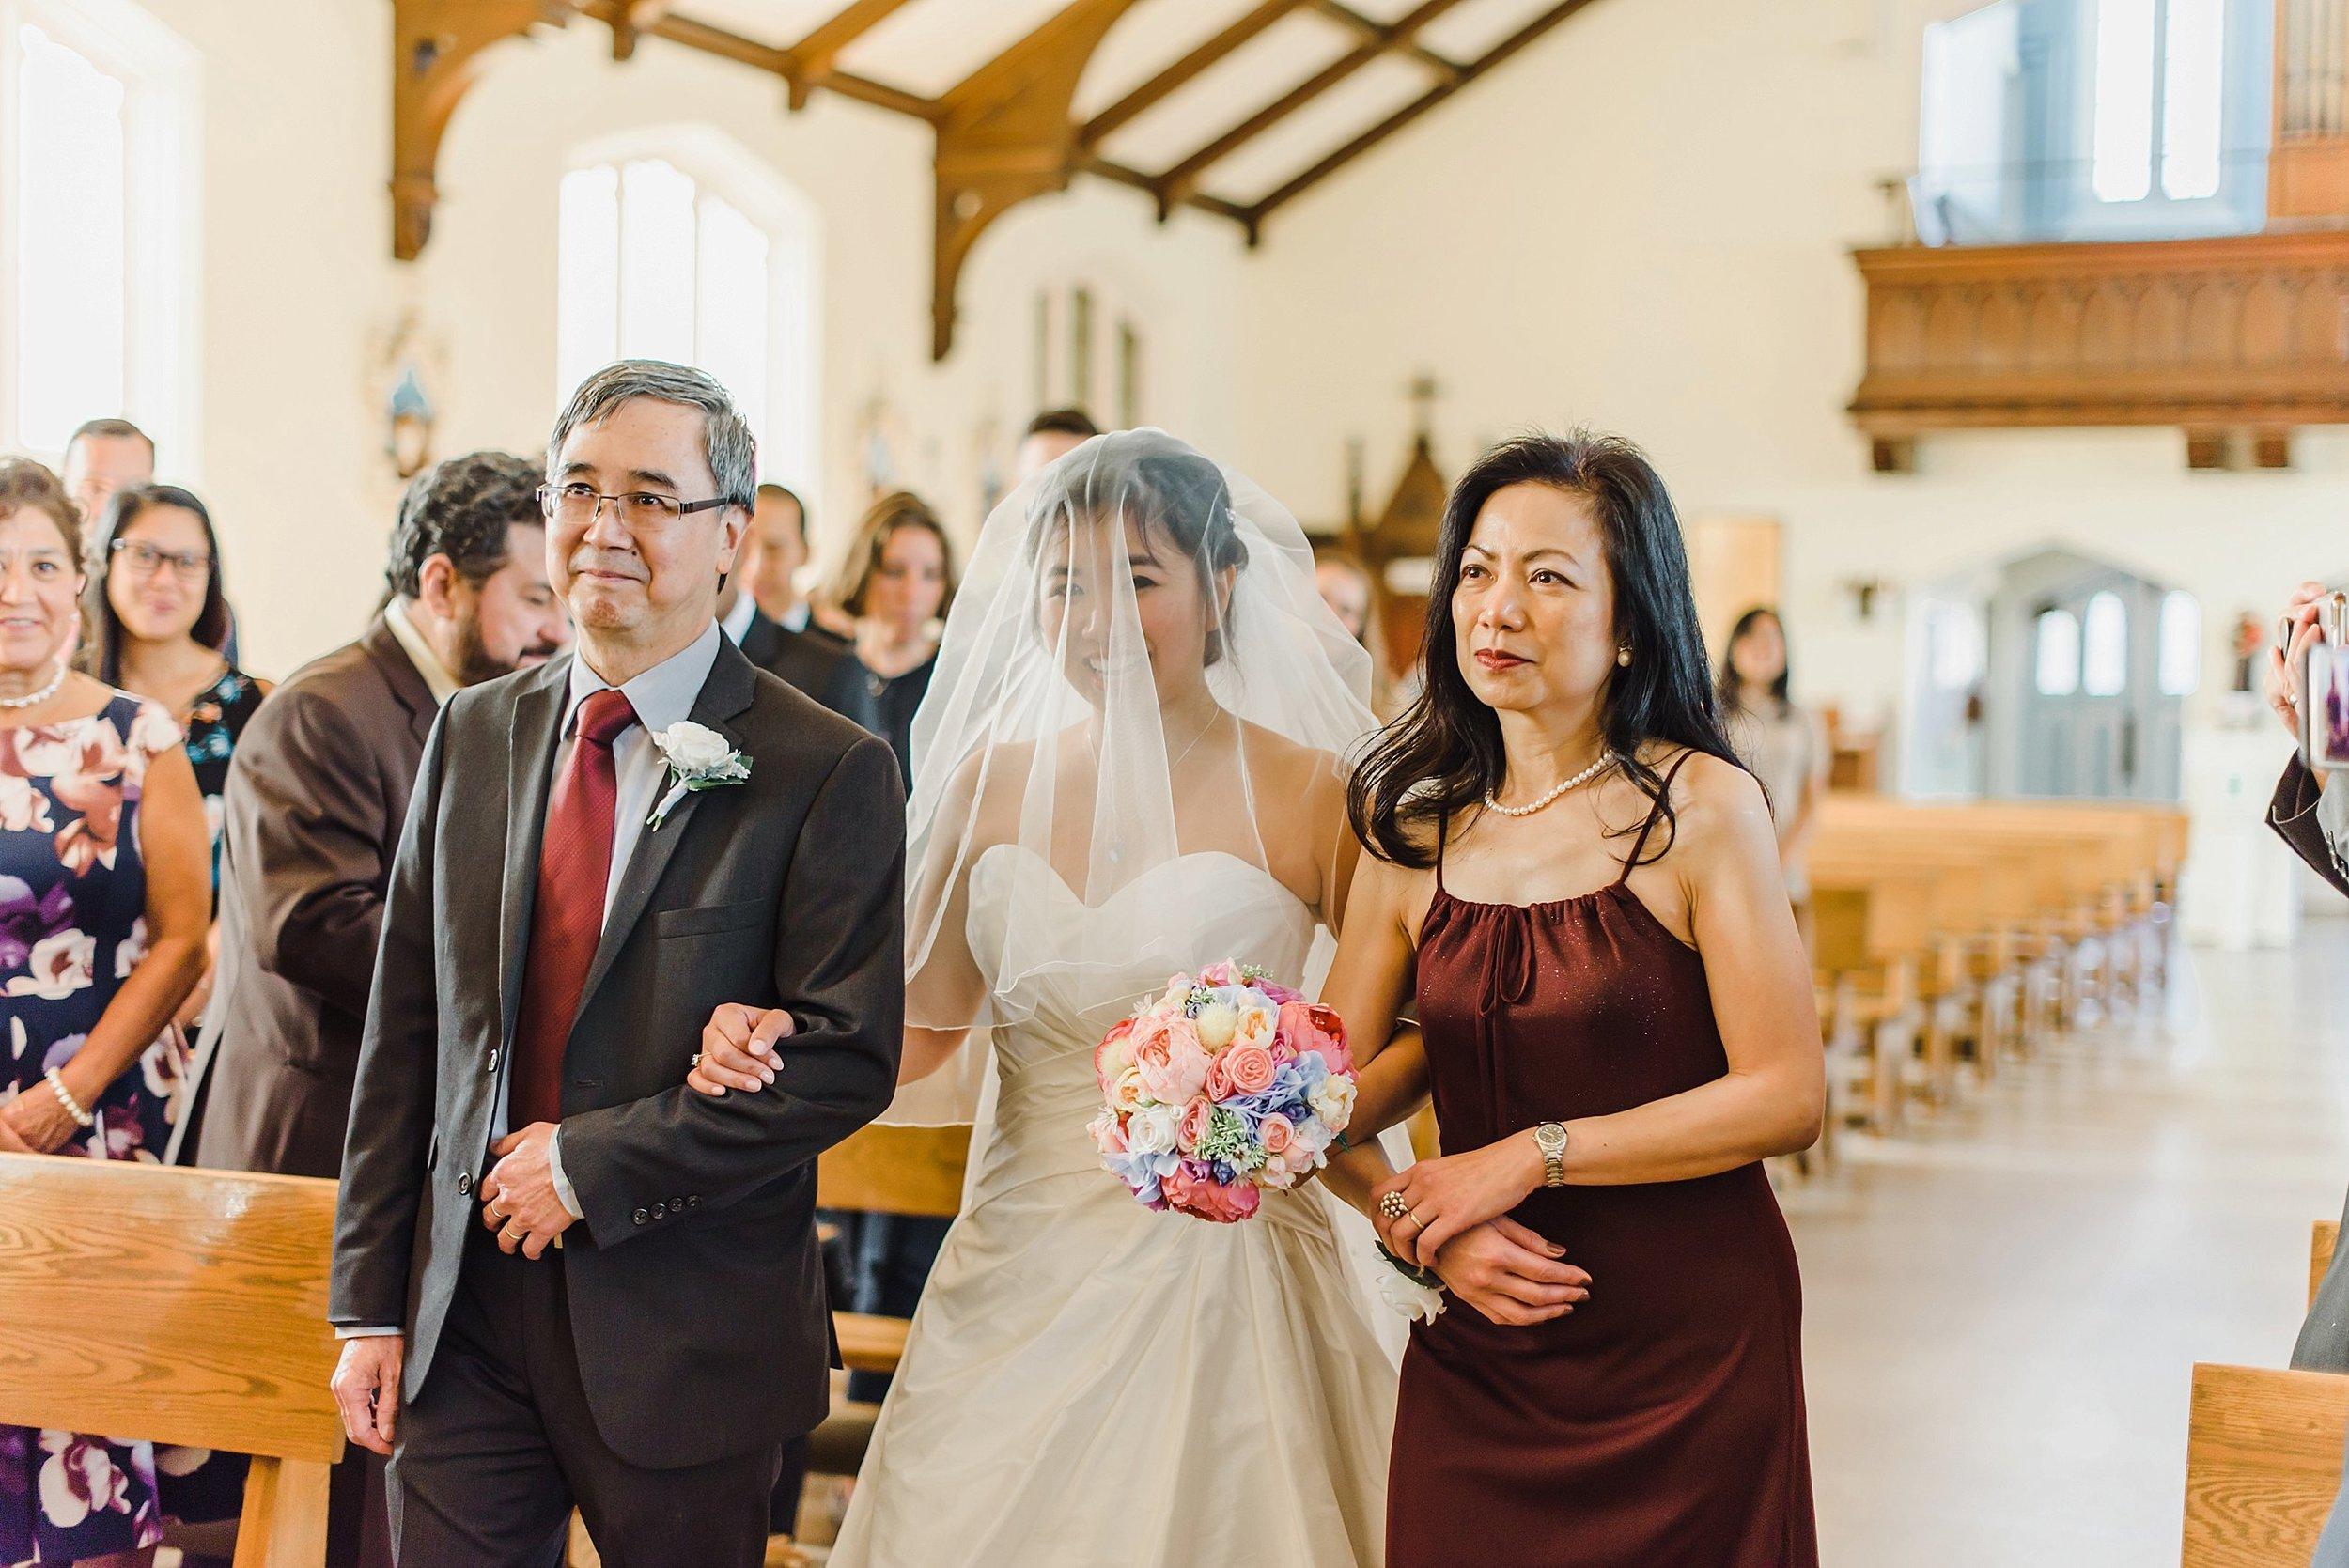 light airy indie fine art ottawa wedding photographer | Ali and Batoul Photography_1486.jpg